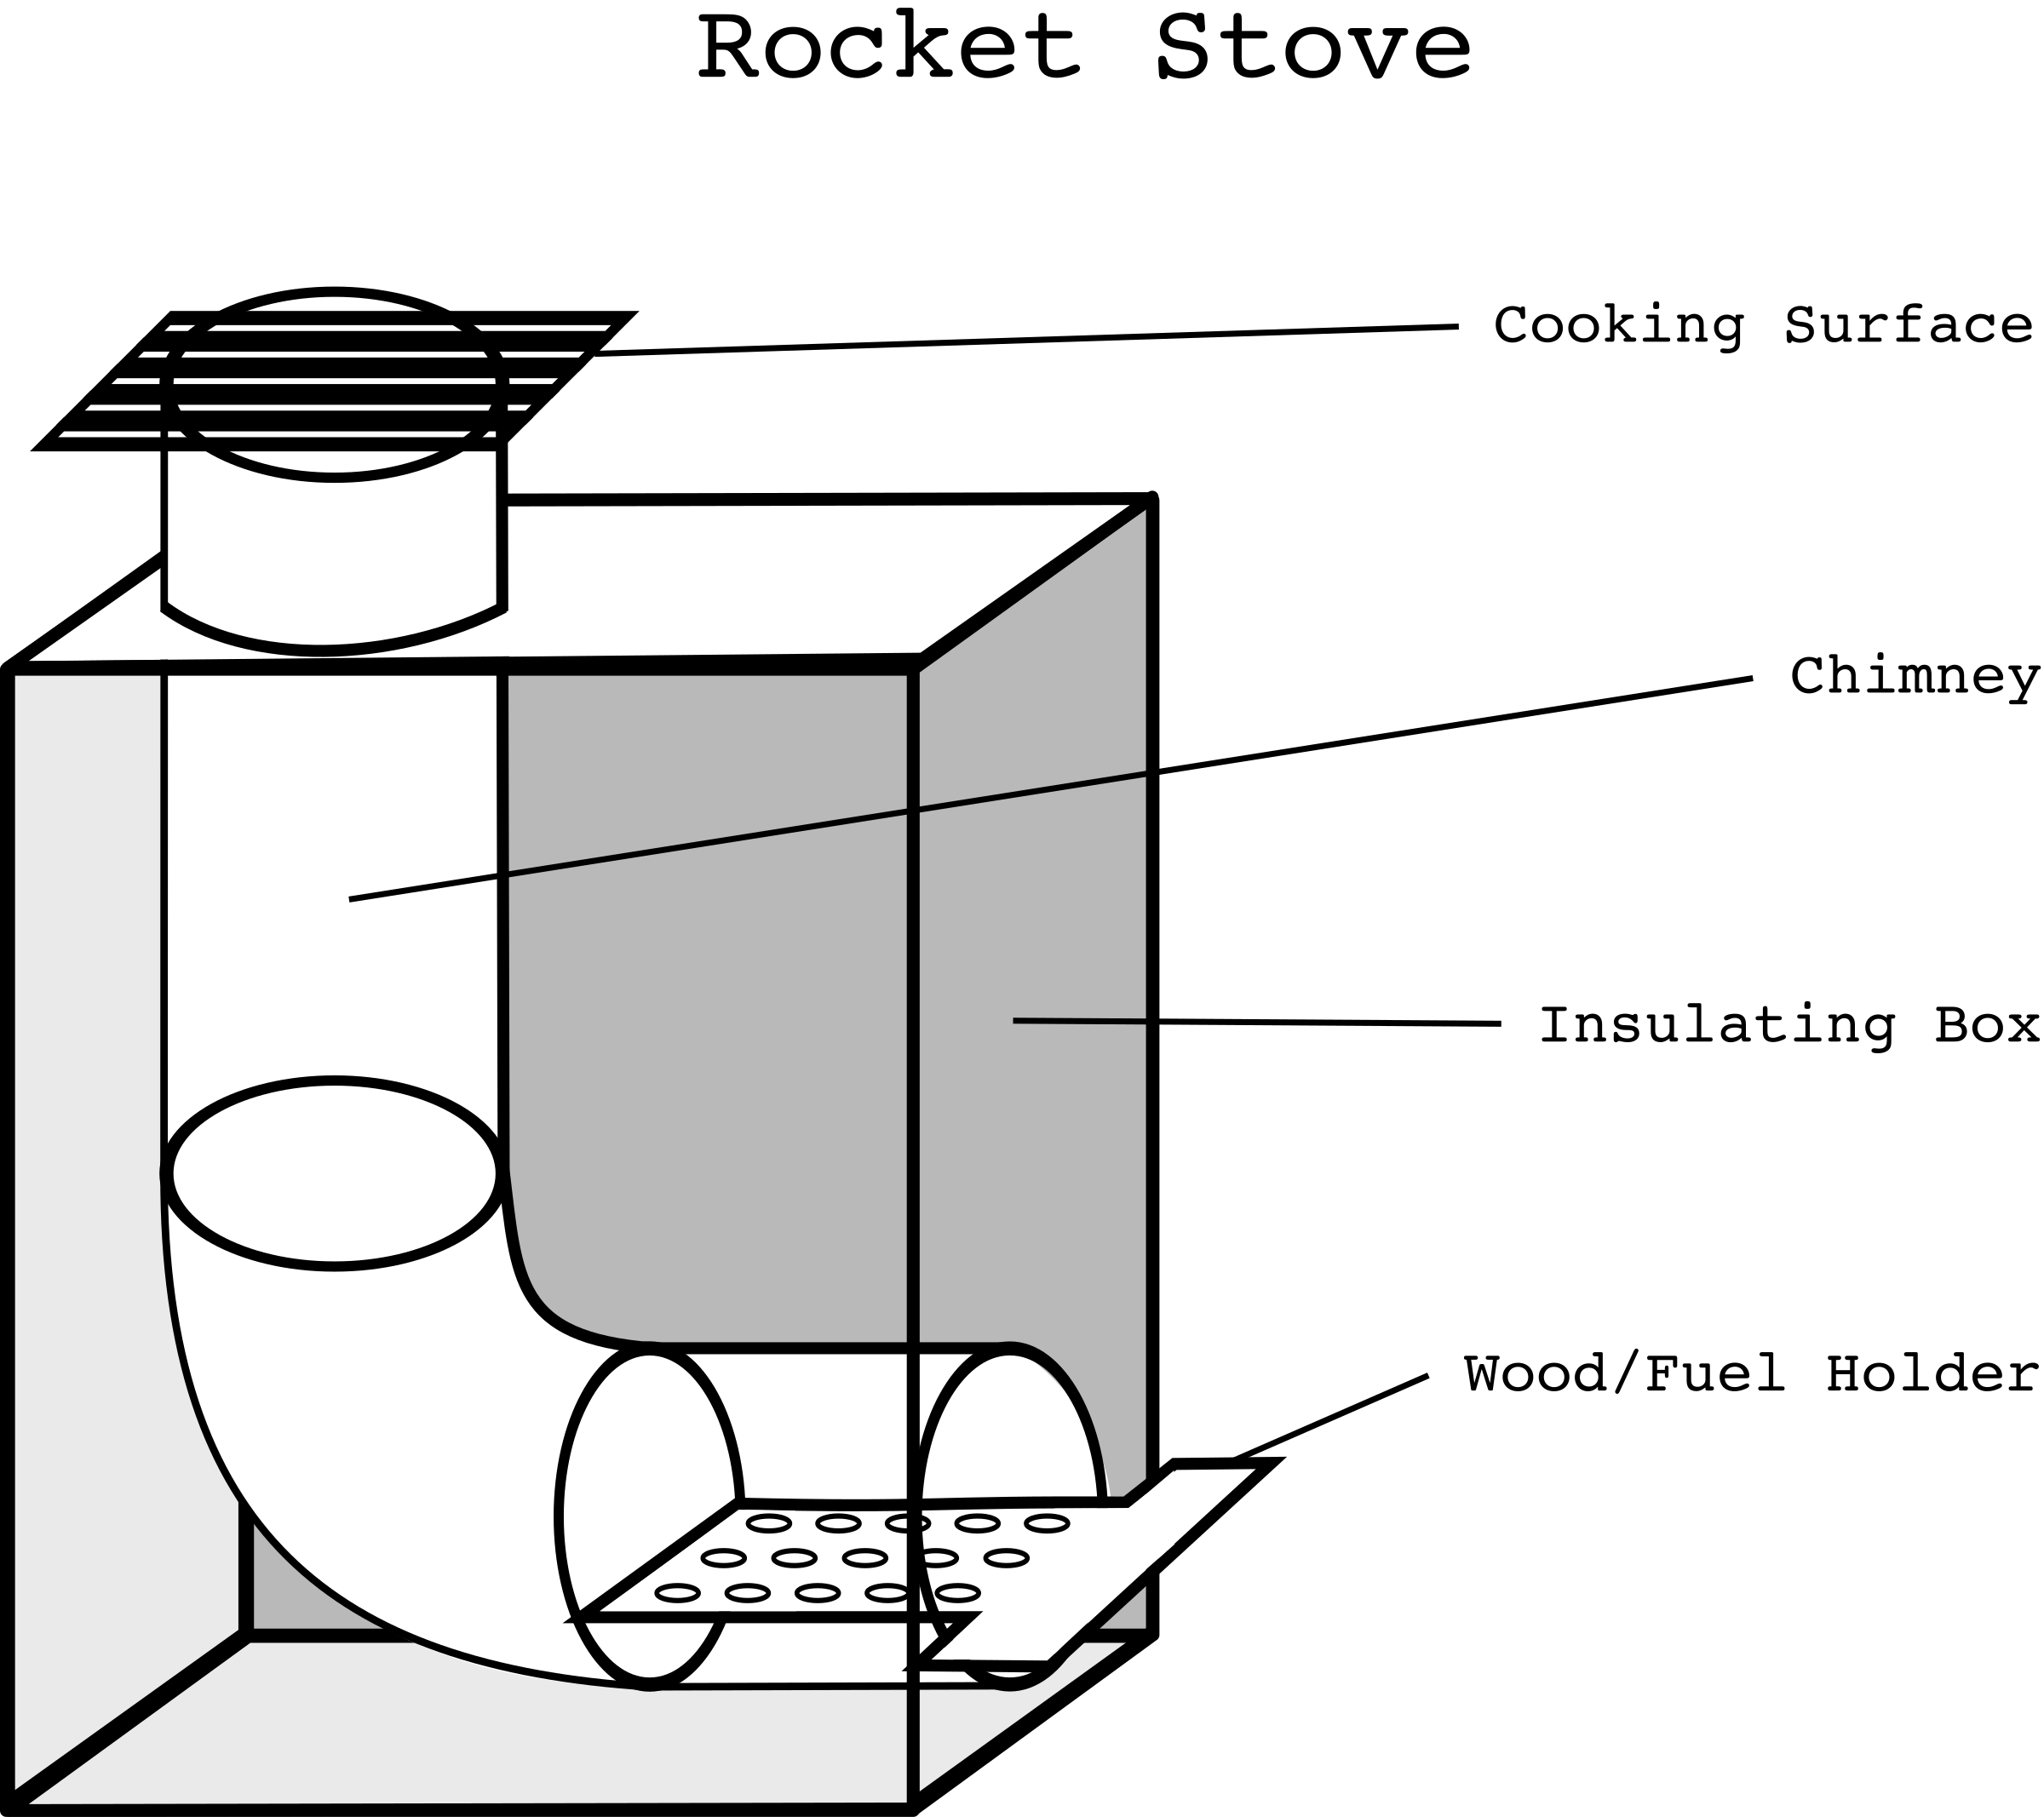 Clipart rocket generic. Stove big image png